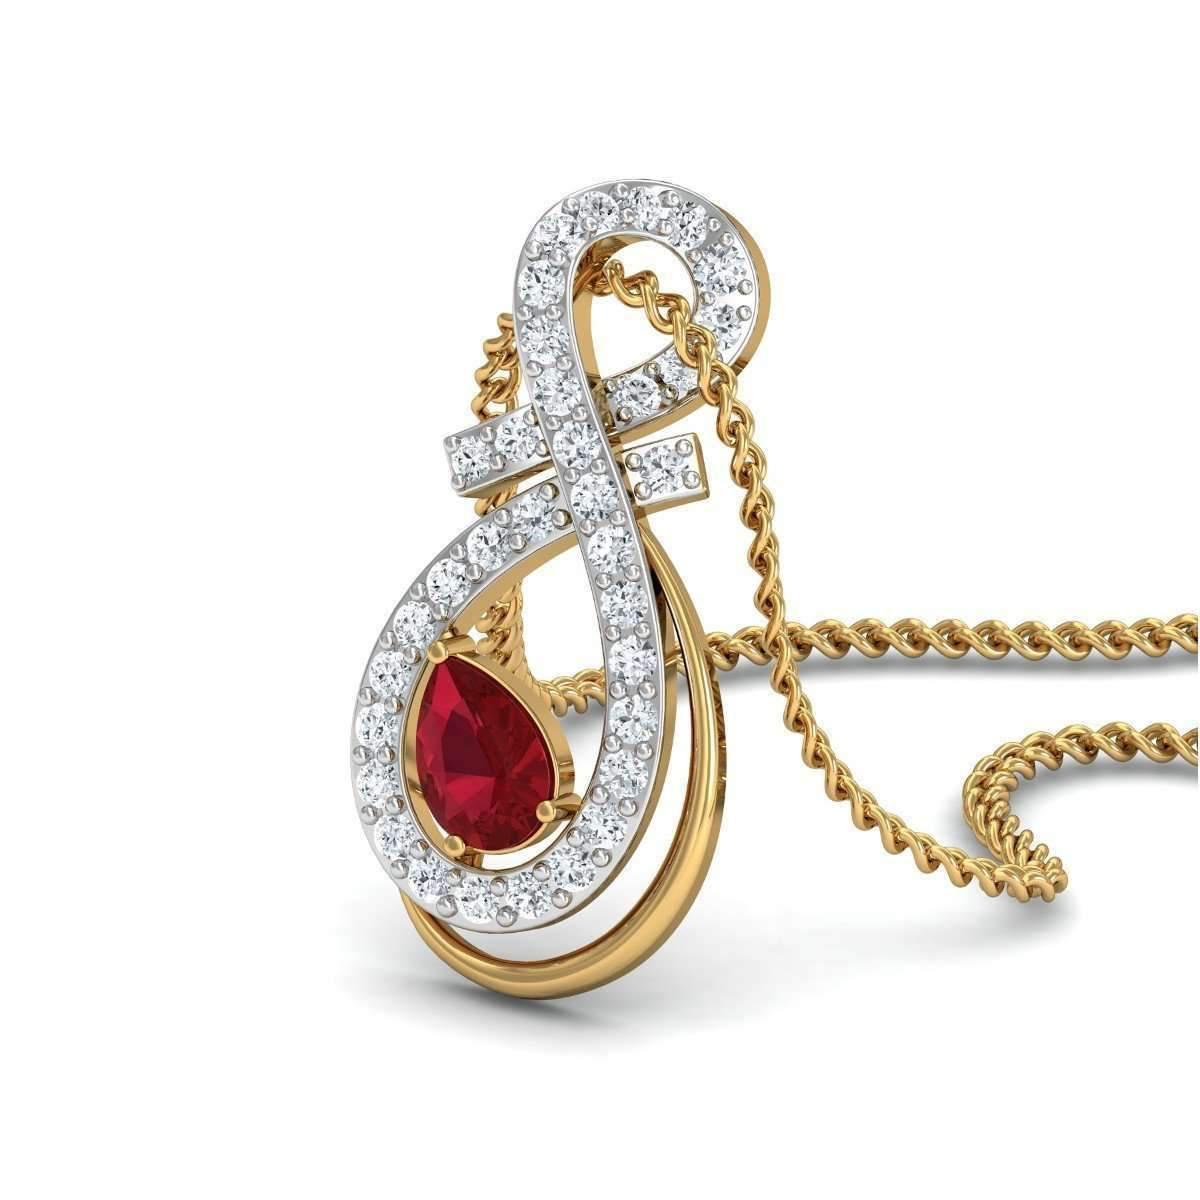 Diamoire Jewels Streamlet Diamond Pendant in 18kt Rose Gold lhgTmGZmU